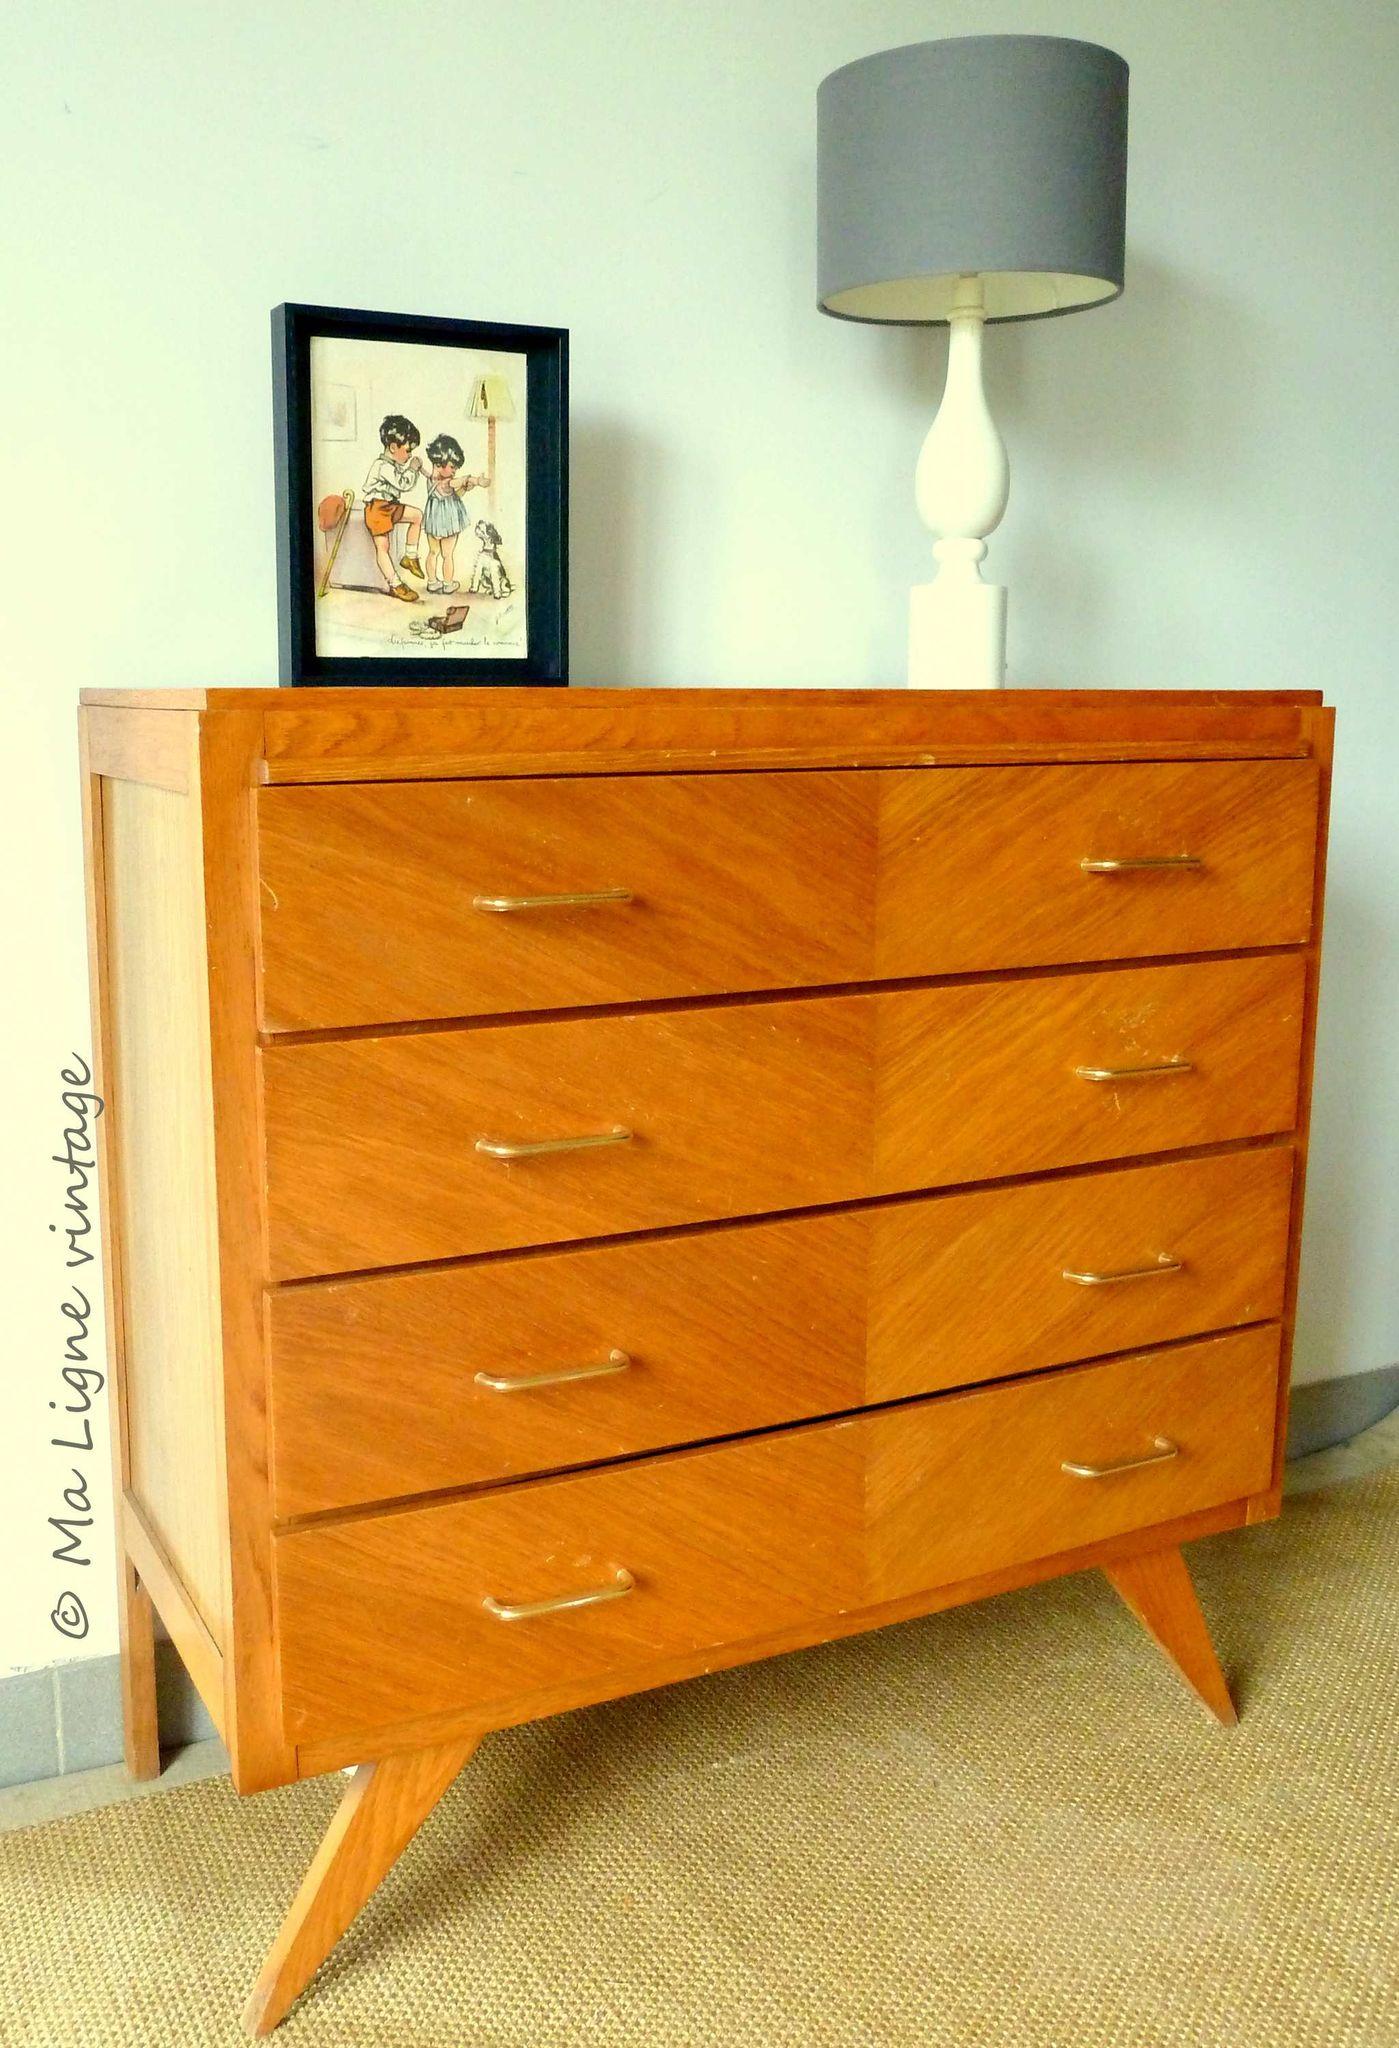 la commode seino ma ligne vintage. Black Bedroom Furniture Sets. Home Design Ideas